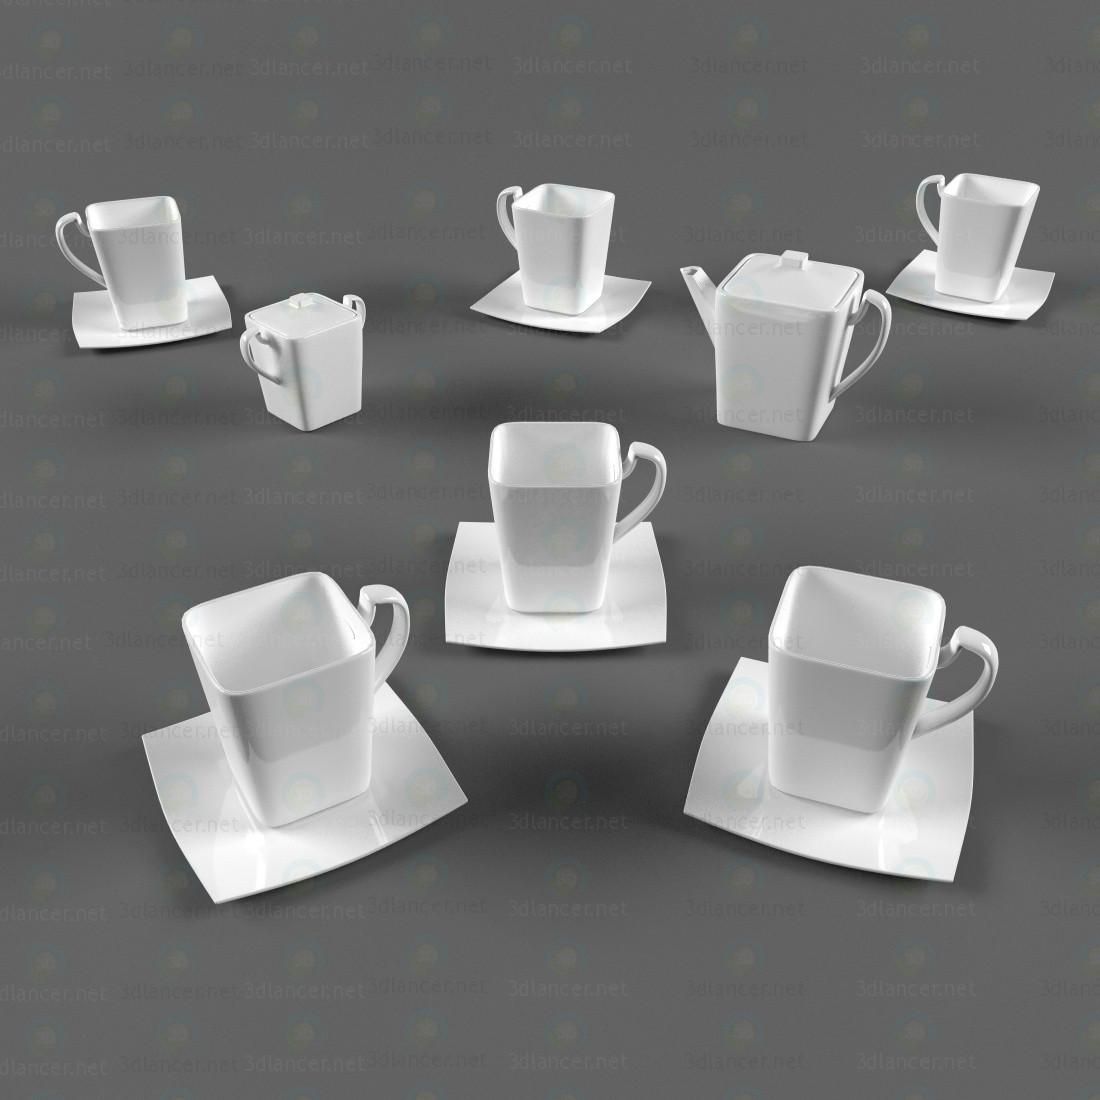 Servicio de café 3D modelo Compro - render